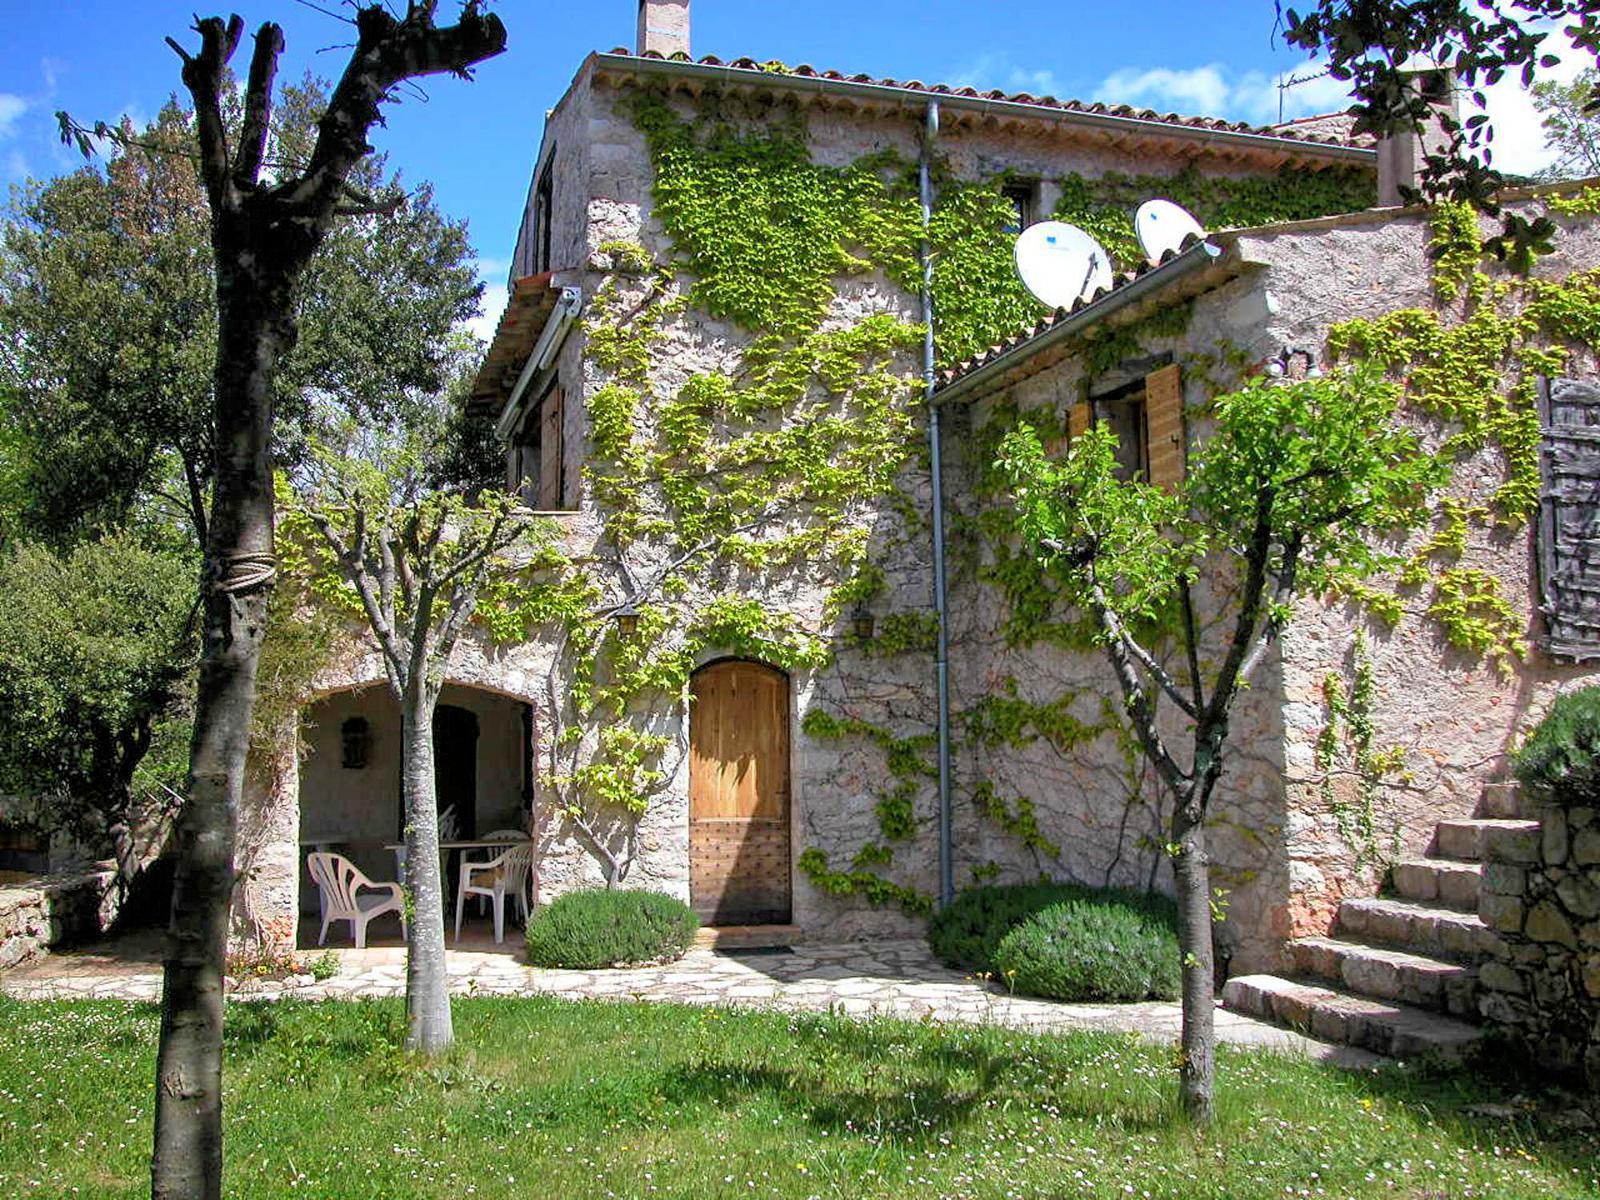 Vakantiehuis in Fox-Amphoux, in Provence-Cote d'Azur.